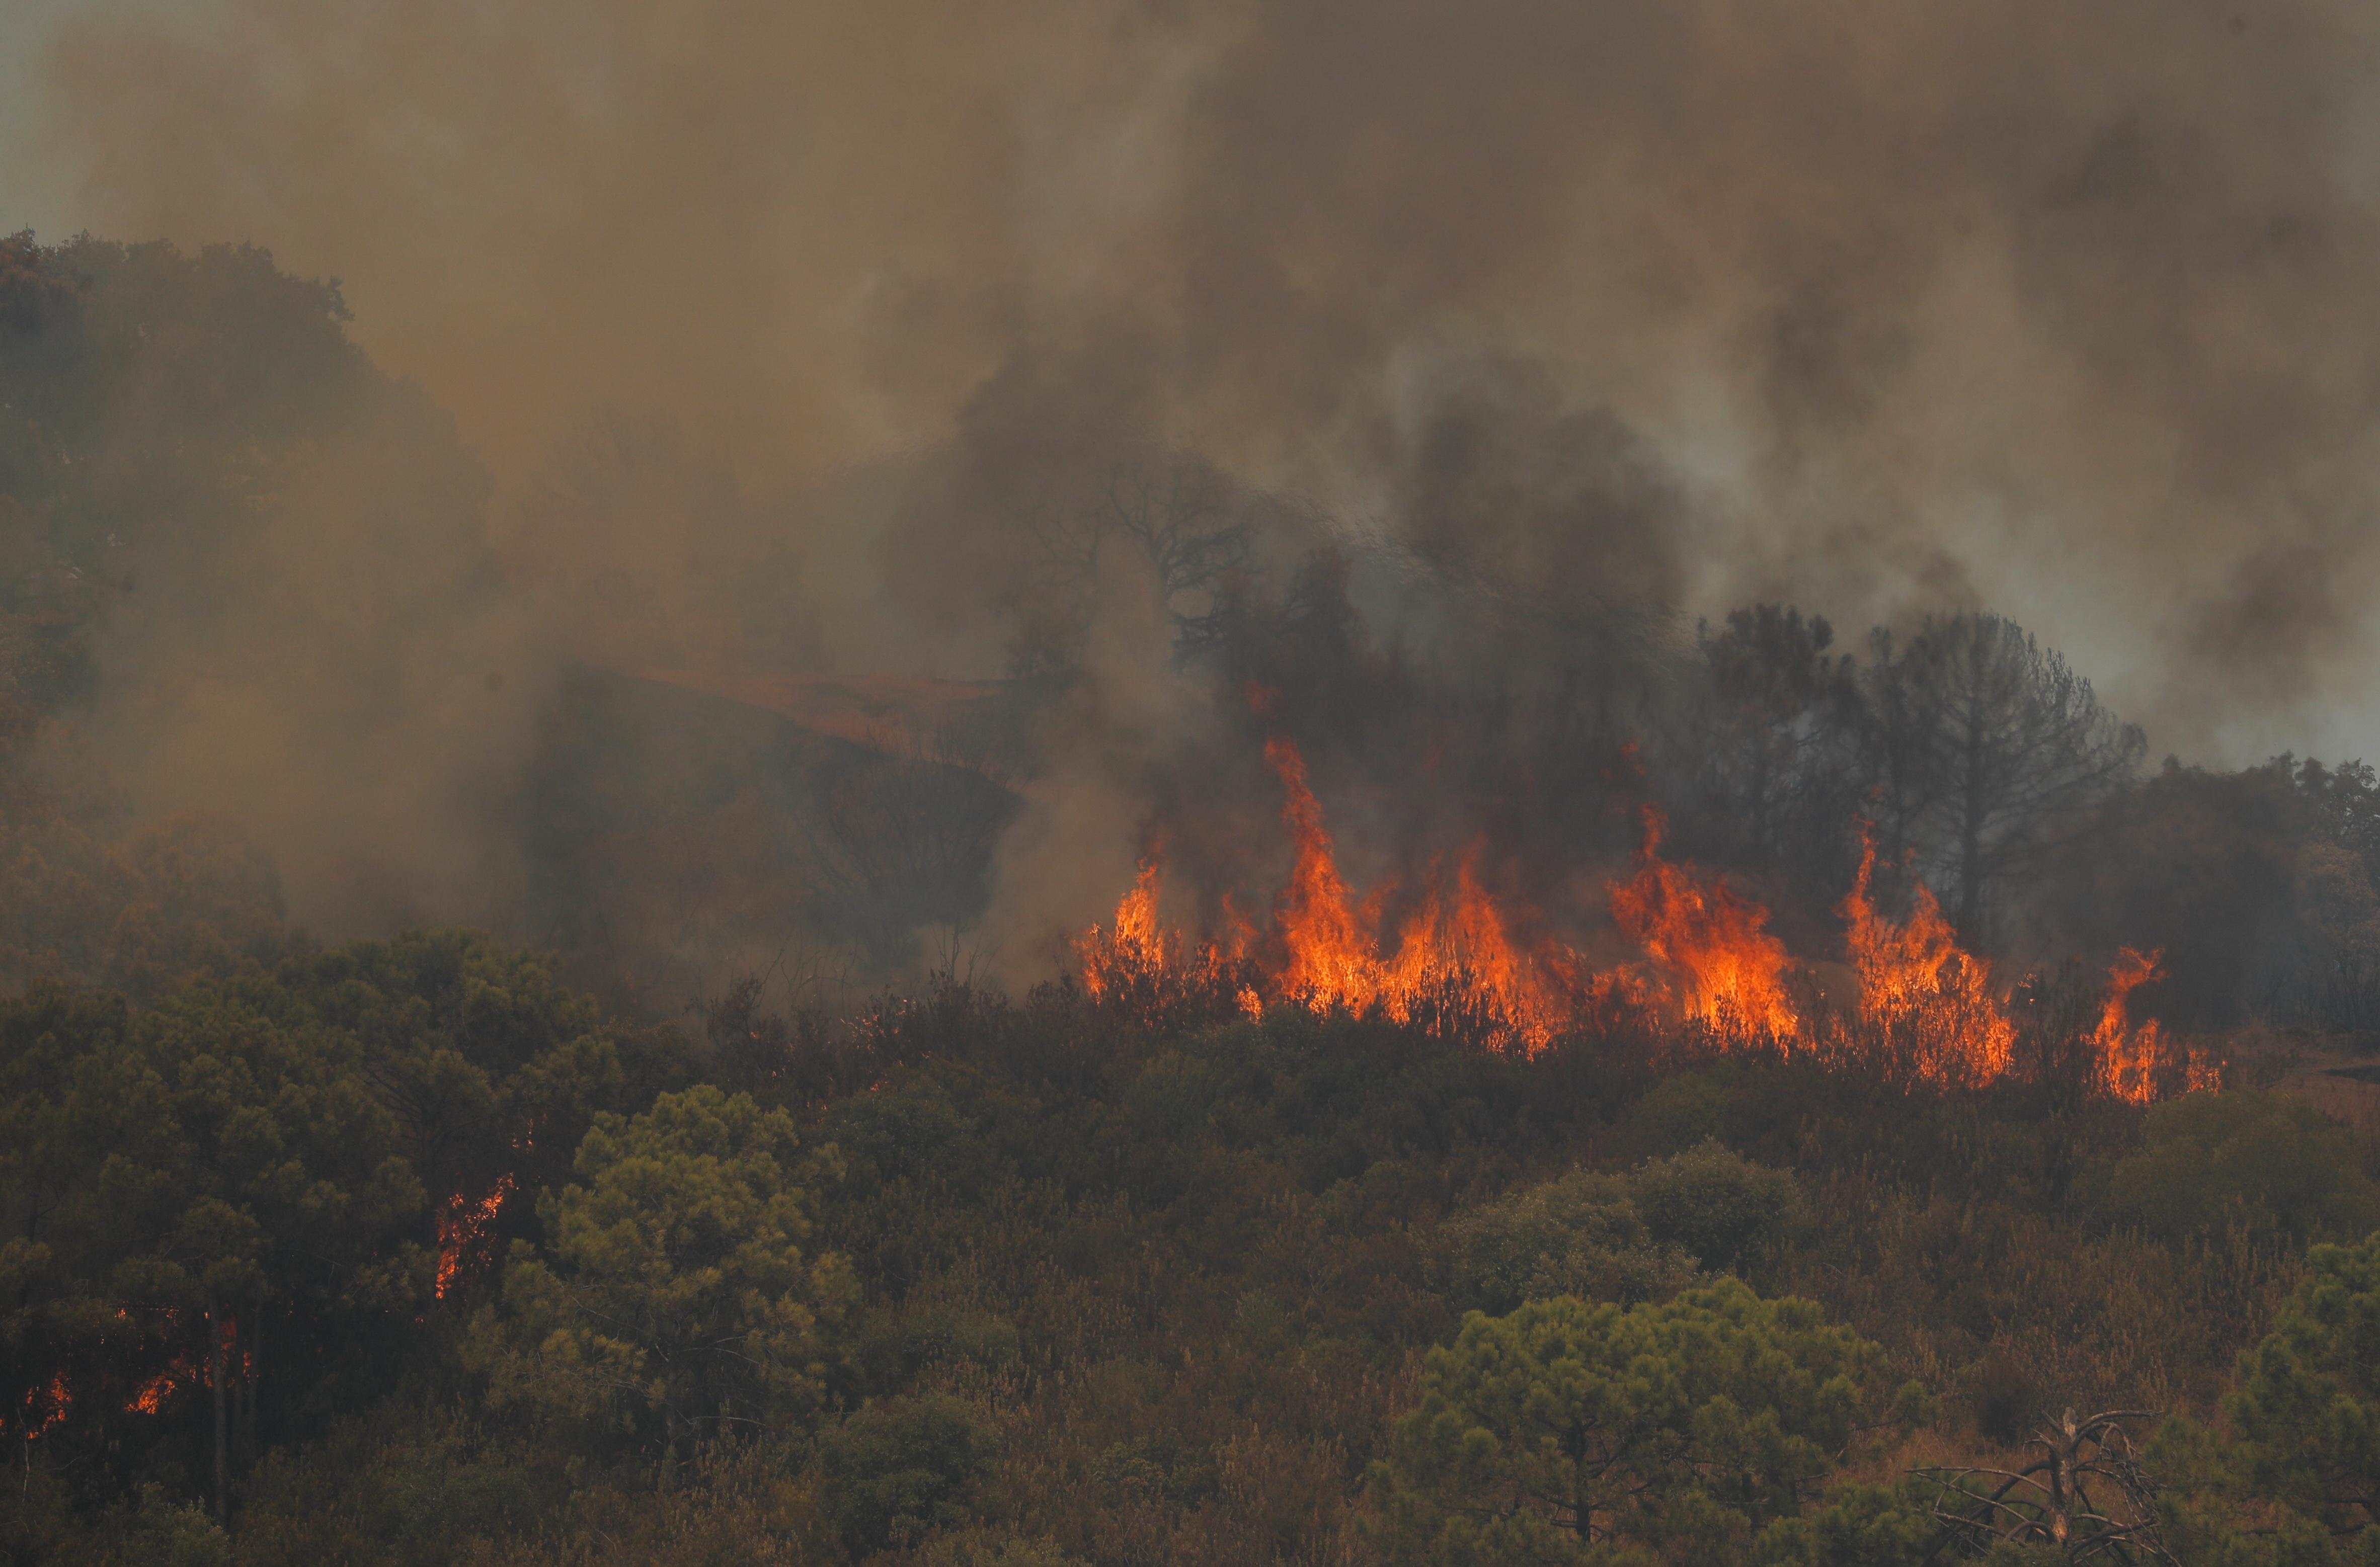 A wildfire burns on Sierra Bermeja mountain in Estepona, Spain, September 9, 2021. REUTERS/Jon Nazca